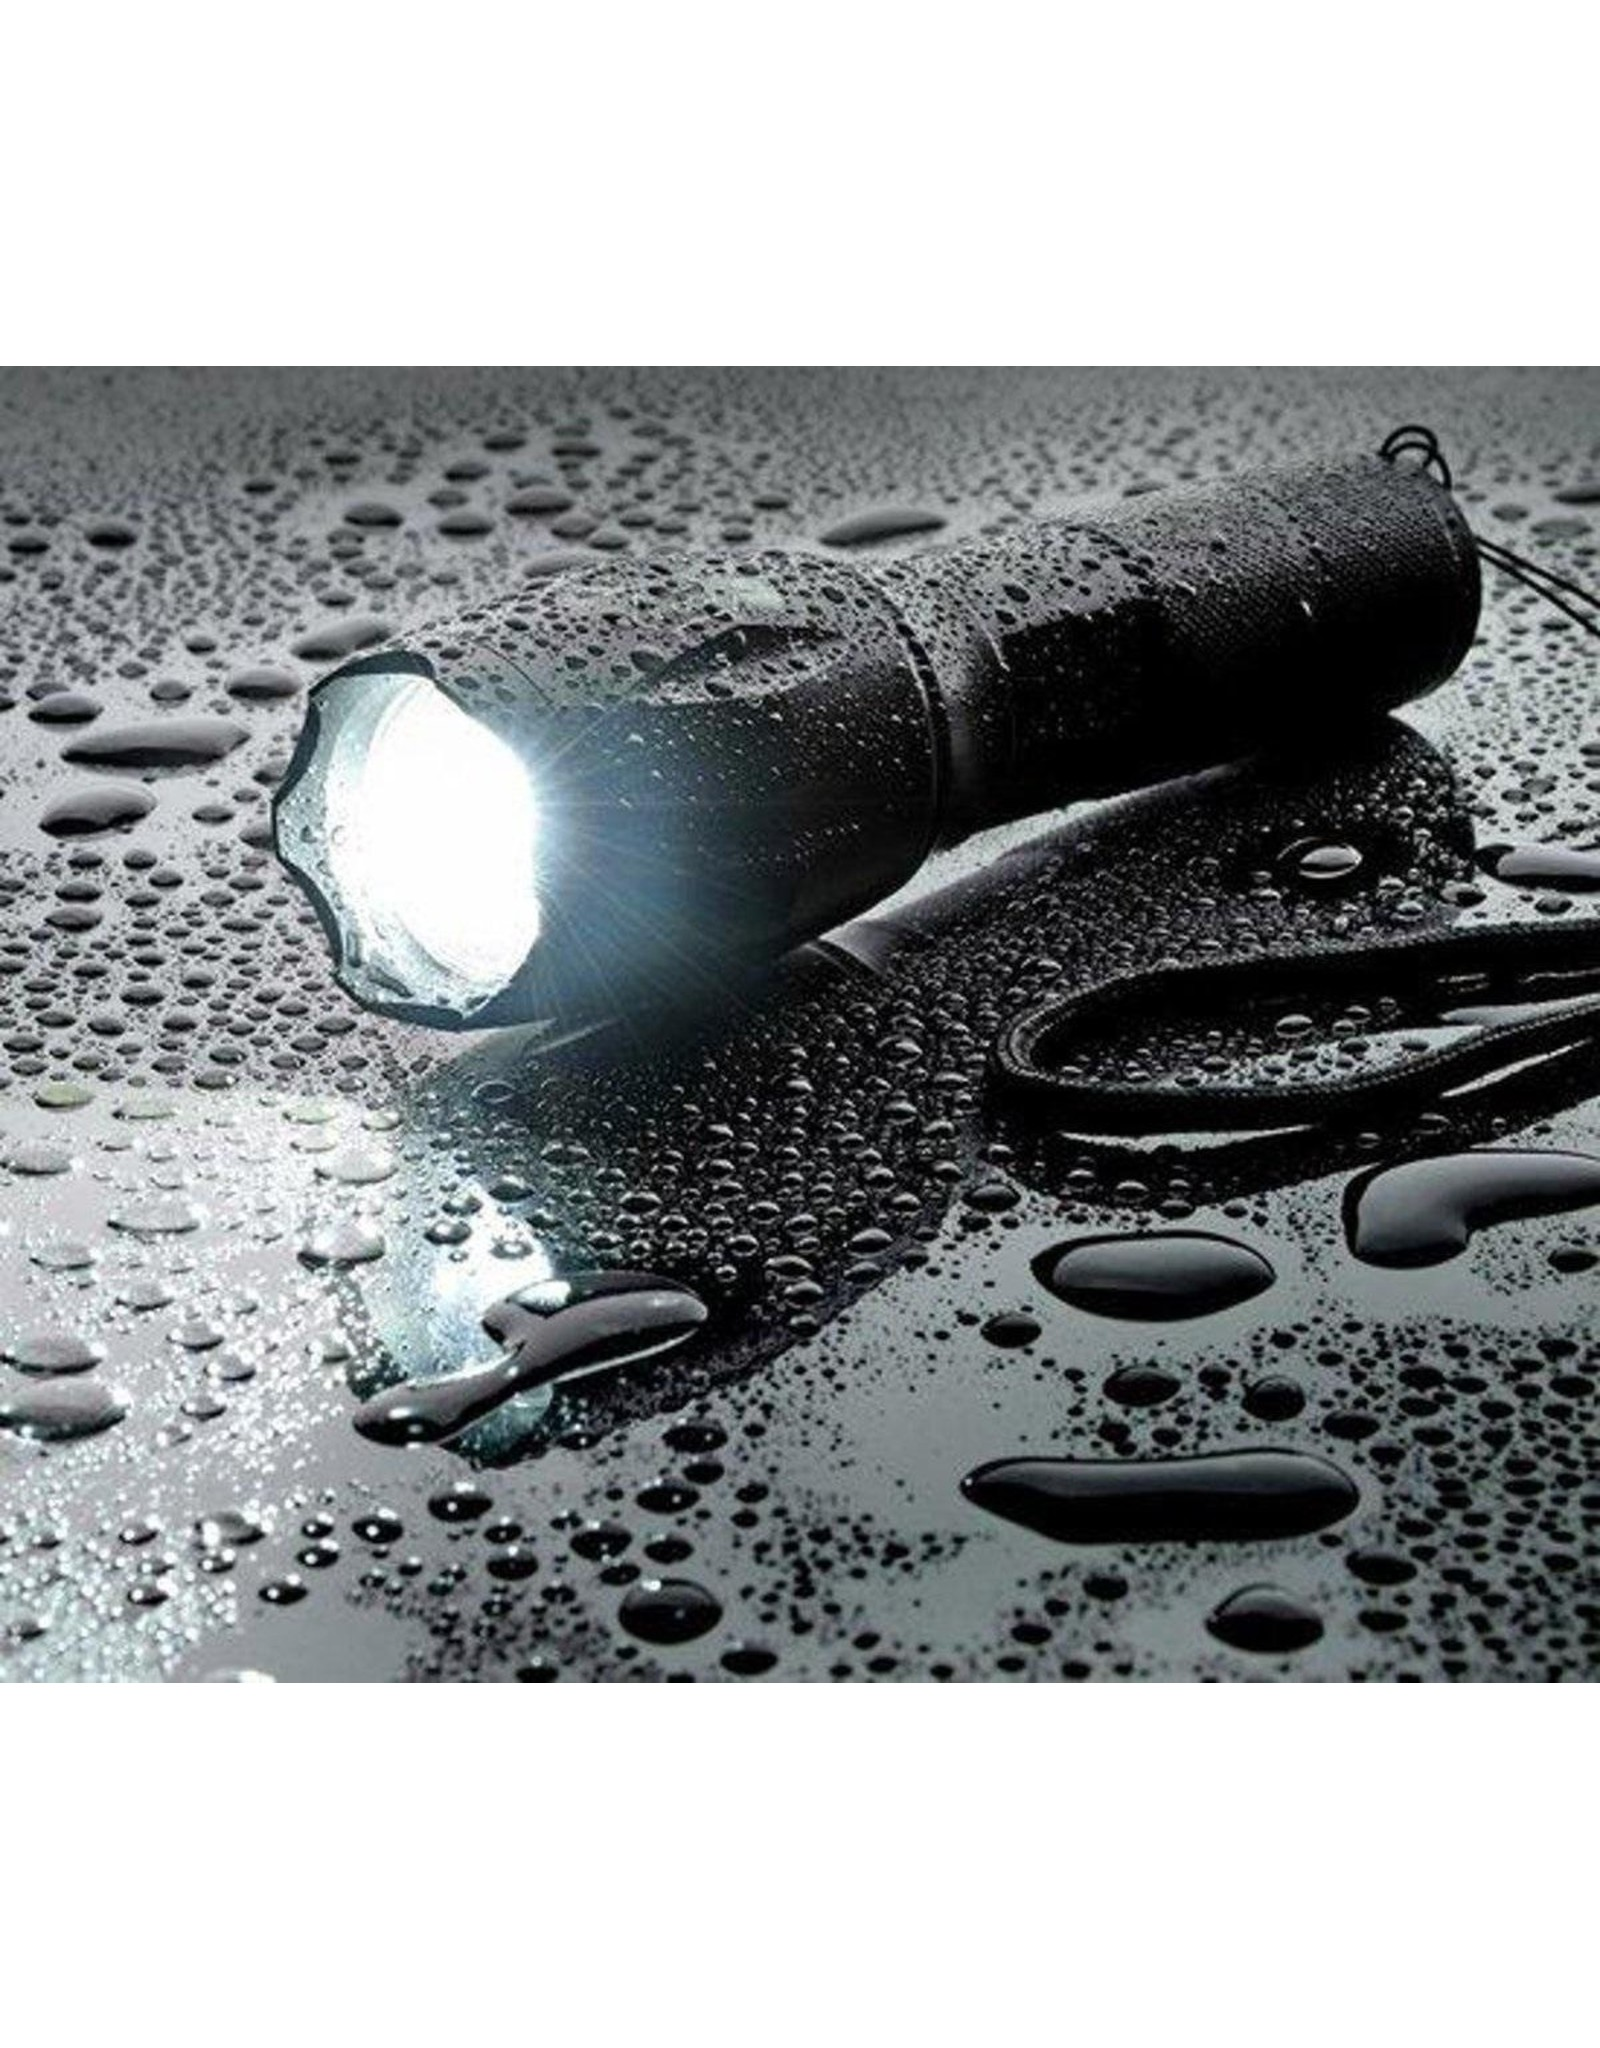 Parya Official Parya Official - Waterdichte LED Zaklamp - Militaire Zaklamp - Zwart